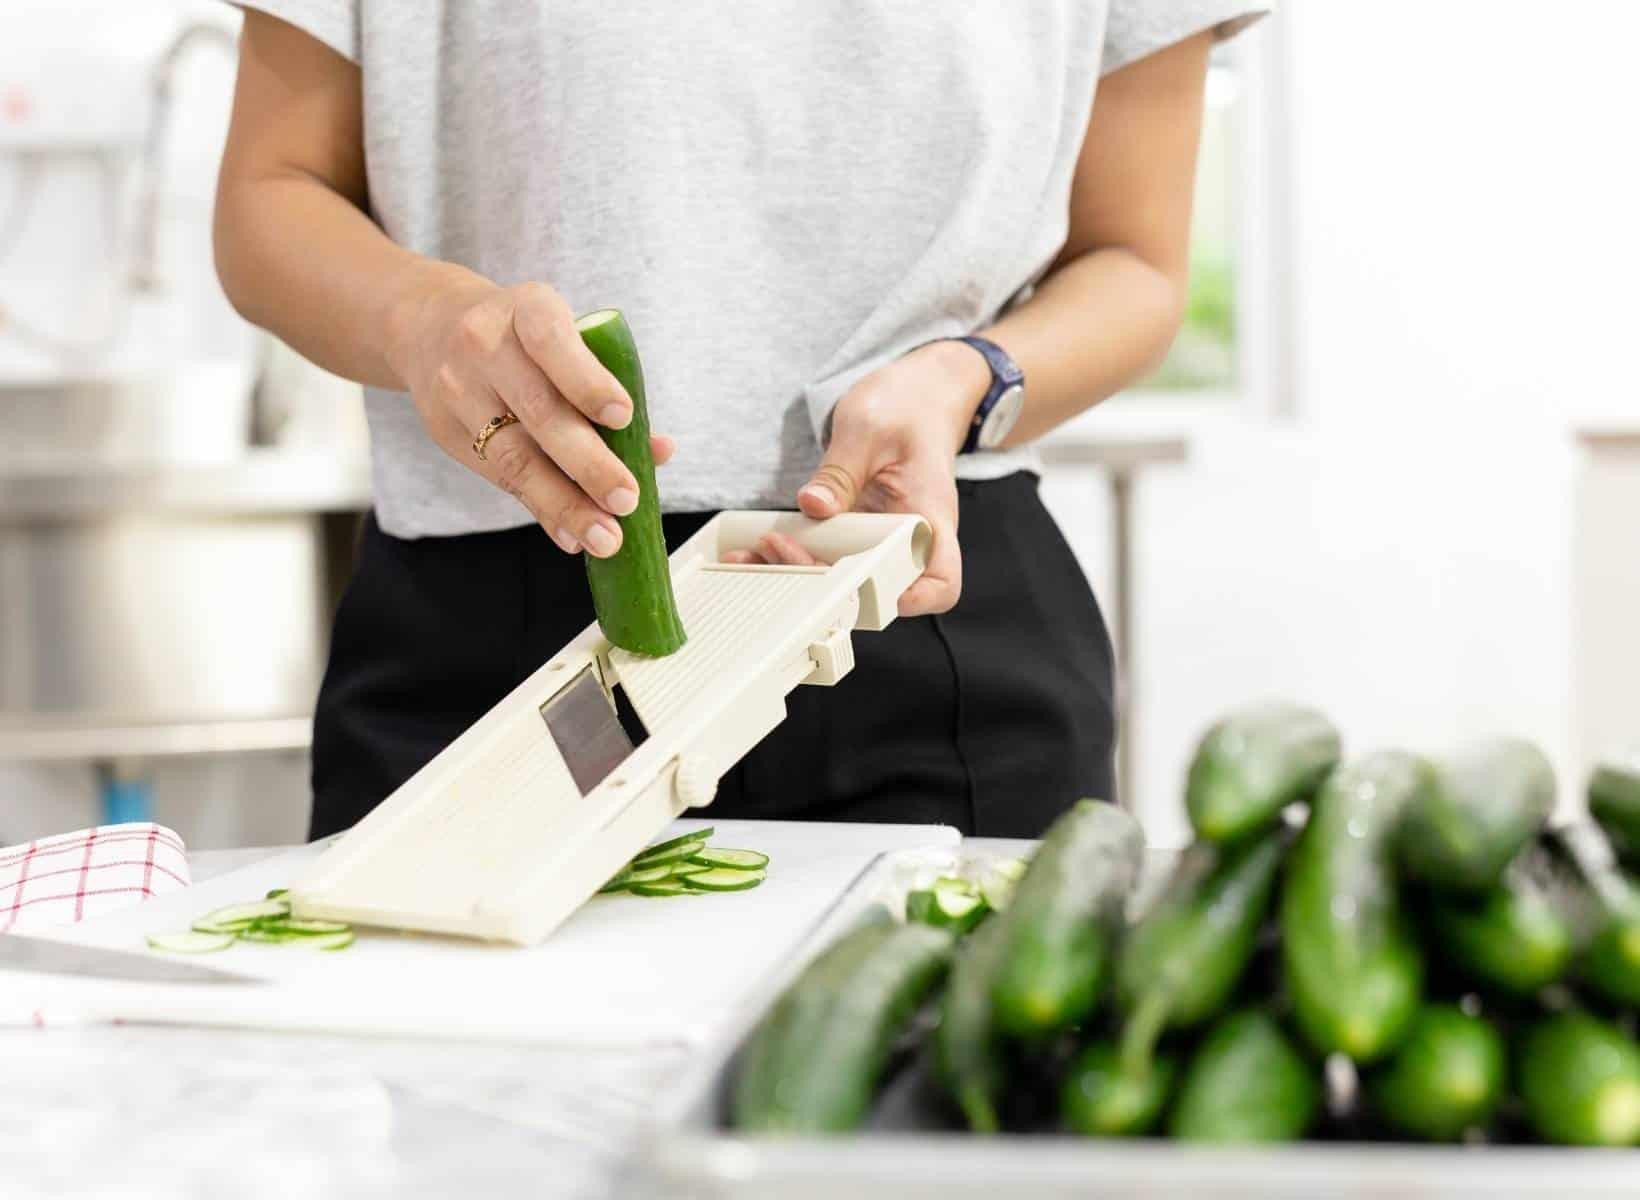 Hands using vegetable slicer to slice CUCUMBERS